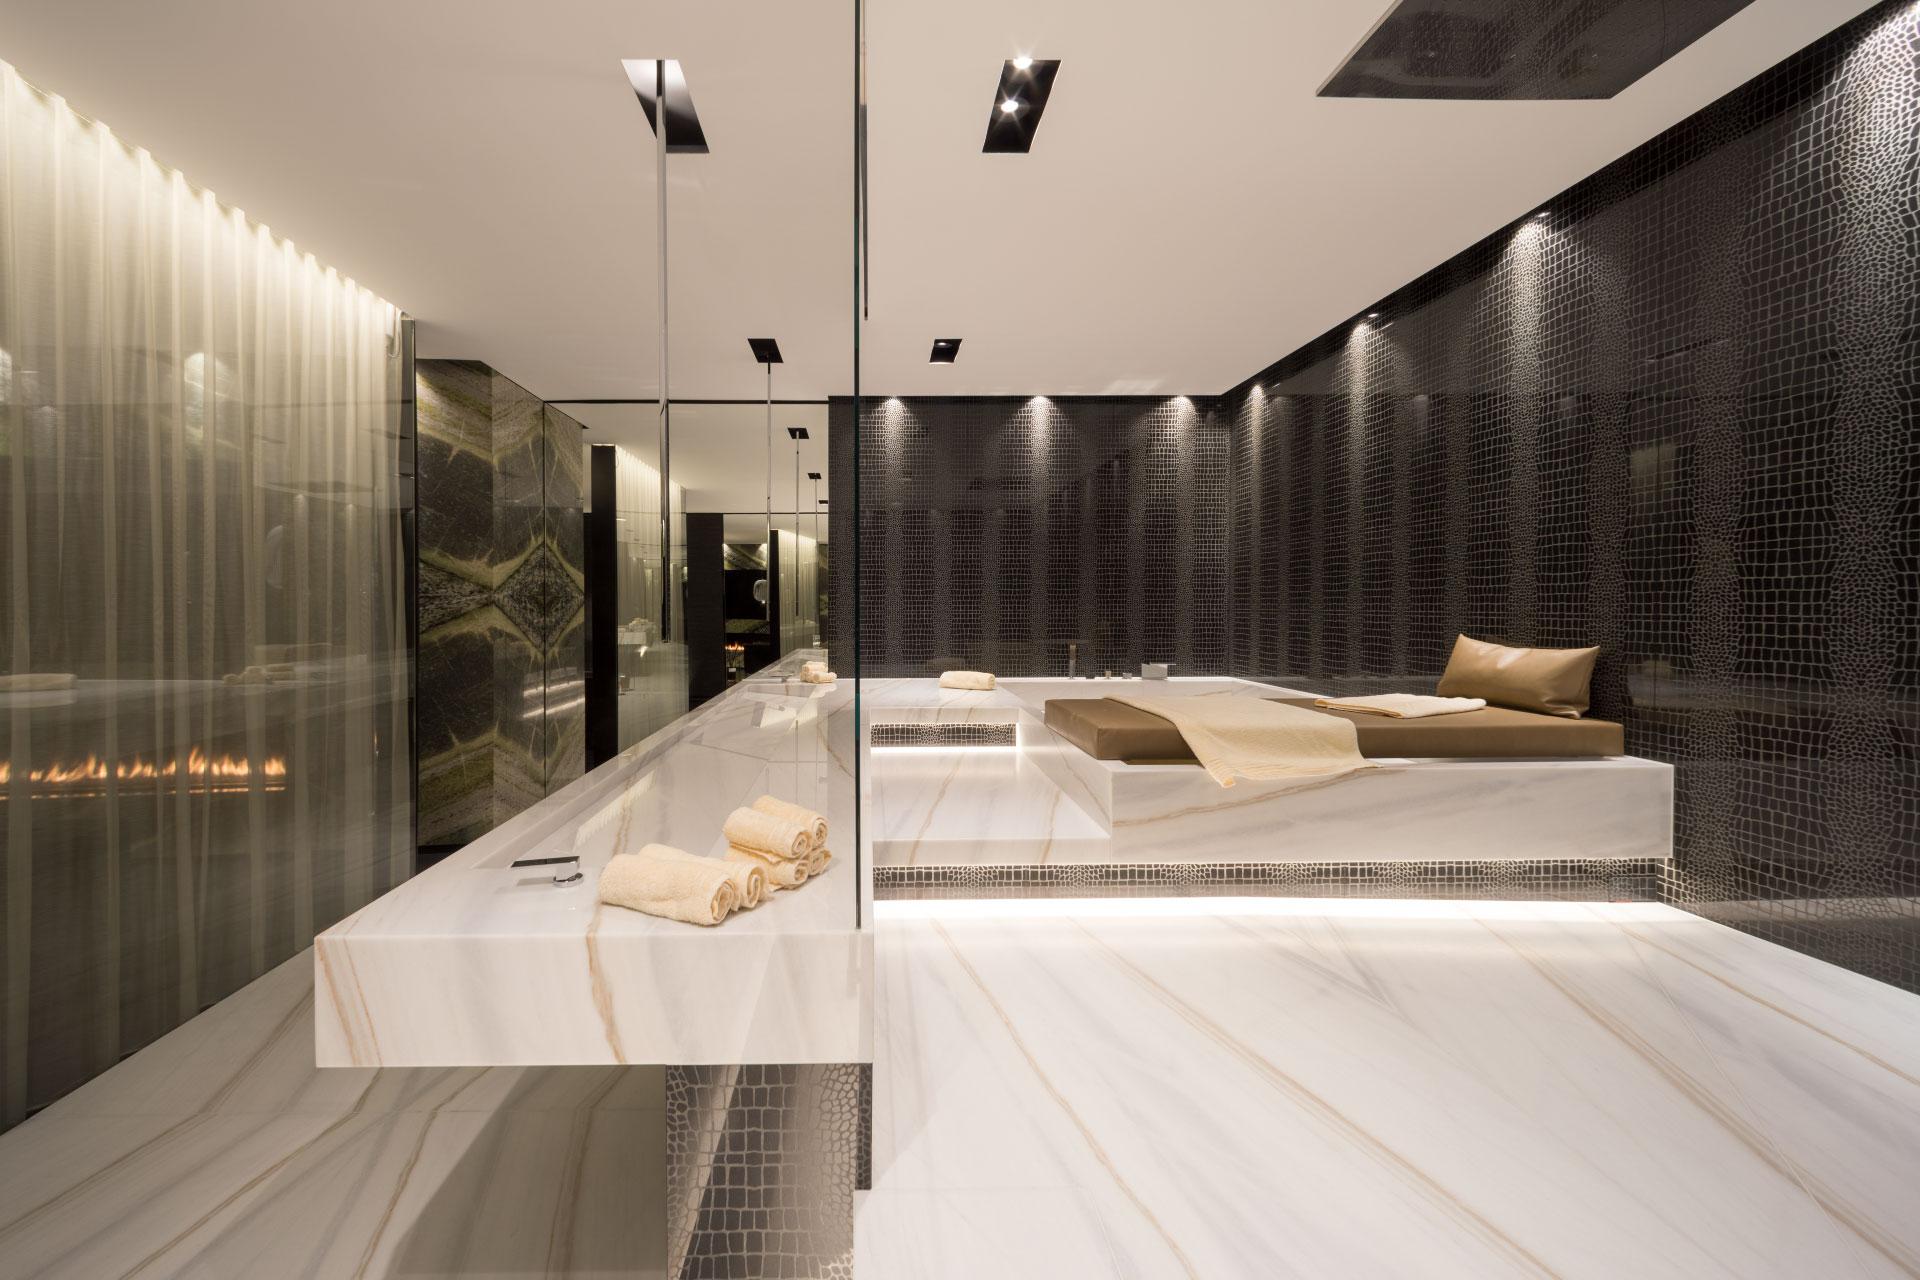 Badezimmer aus Naturstein Bianco Lasa Covelano & Nero ...